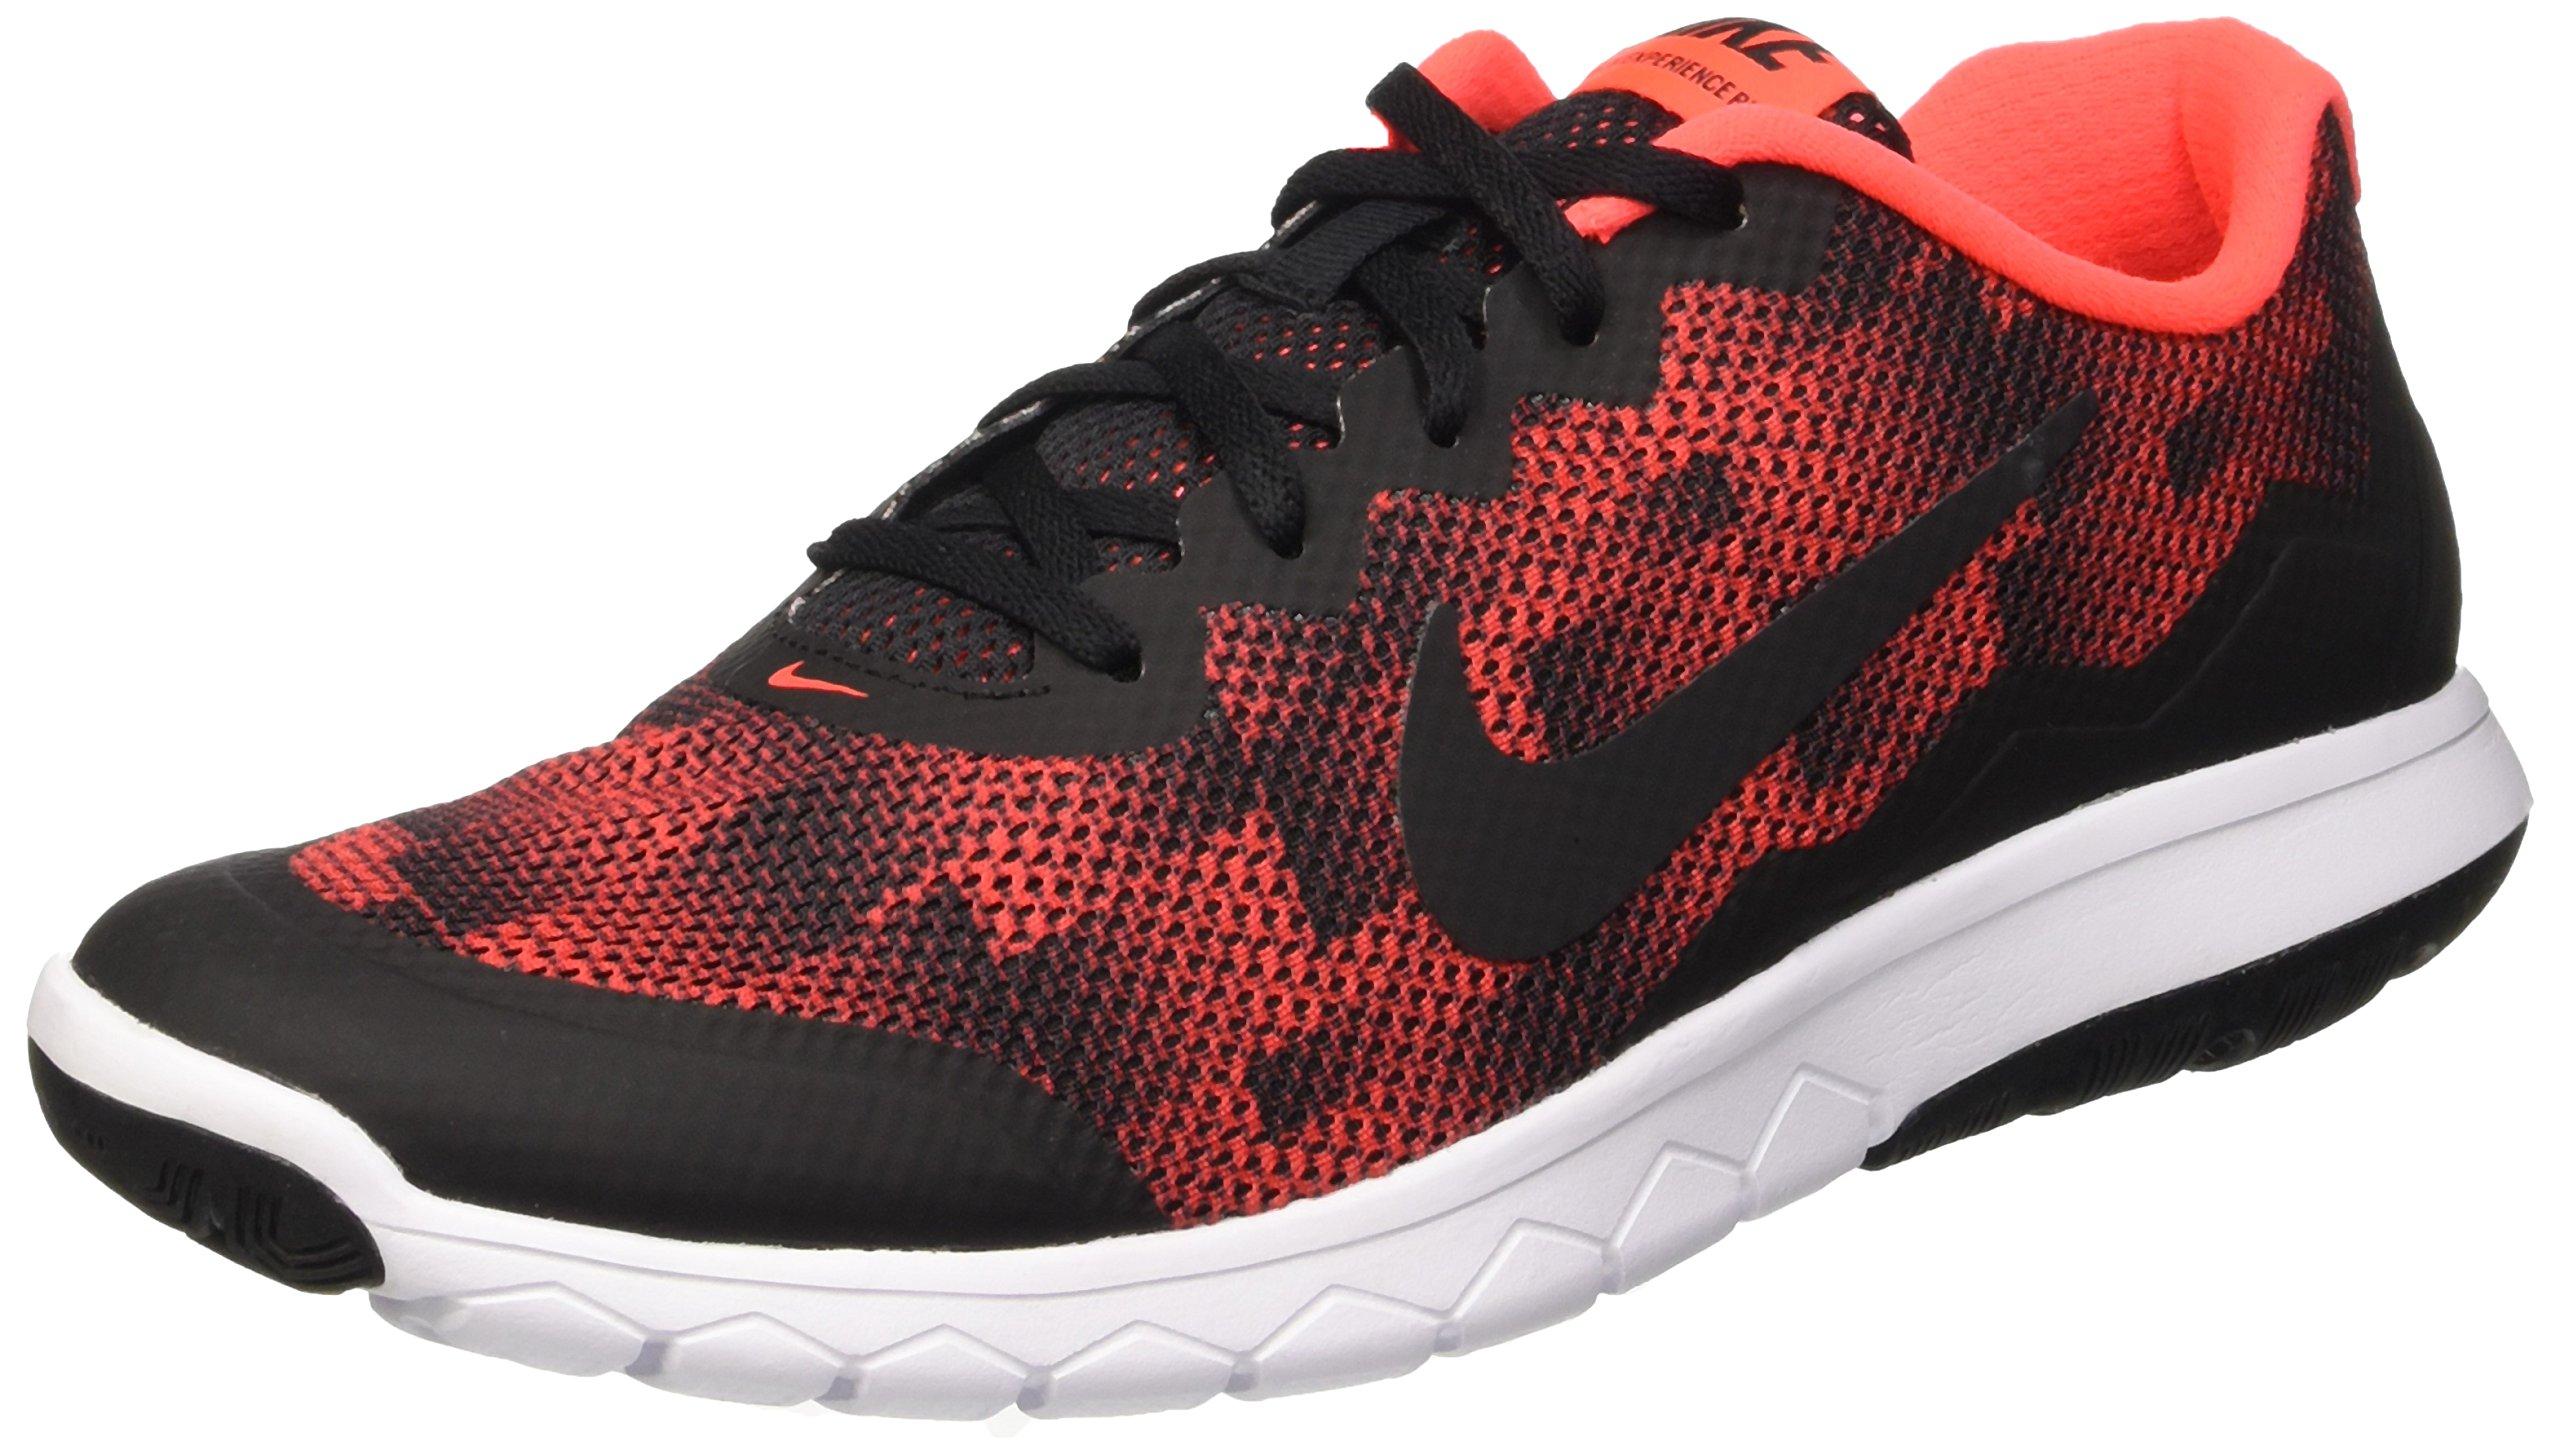 b62cbe072051 Galleon - Nike Men s Flex Experience Rn 4 Prem Bright Crimson Black White Running  Shoe 11.5 Men US